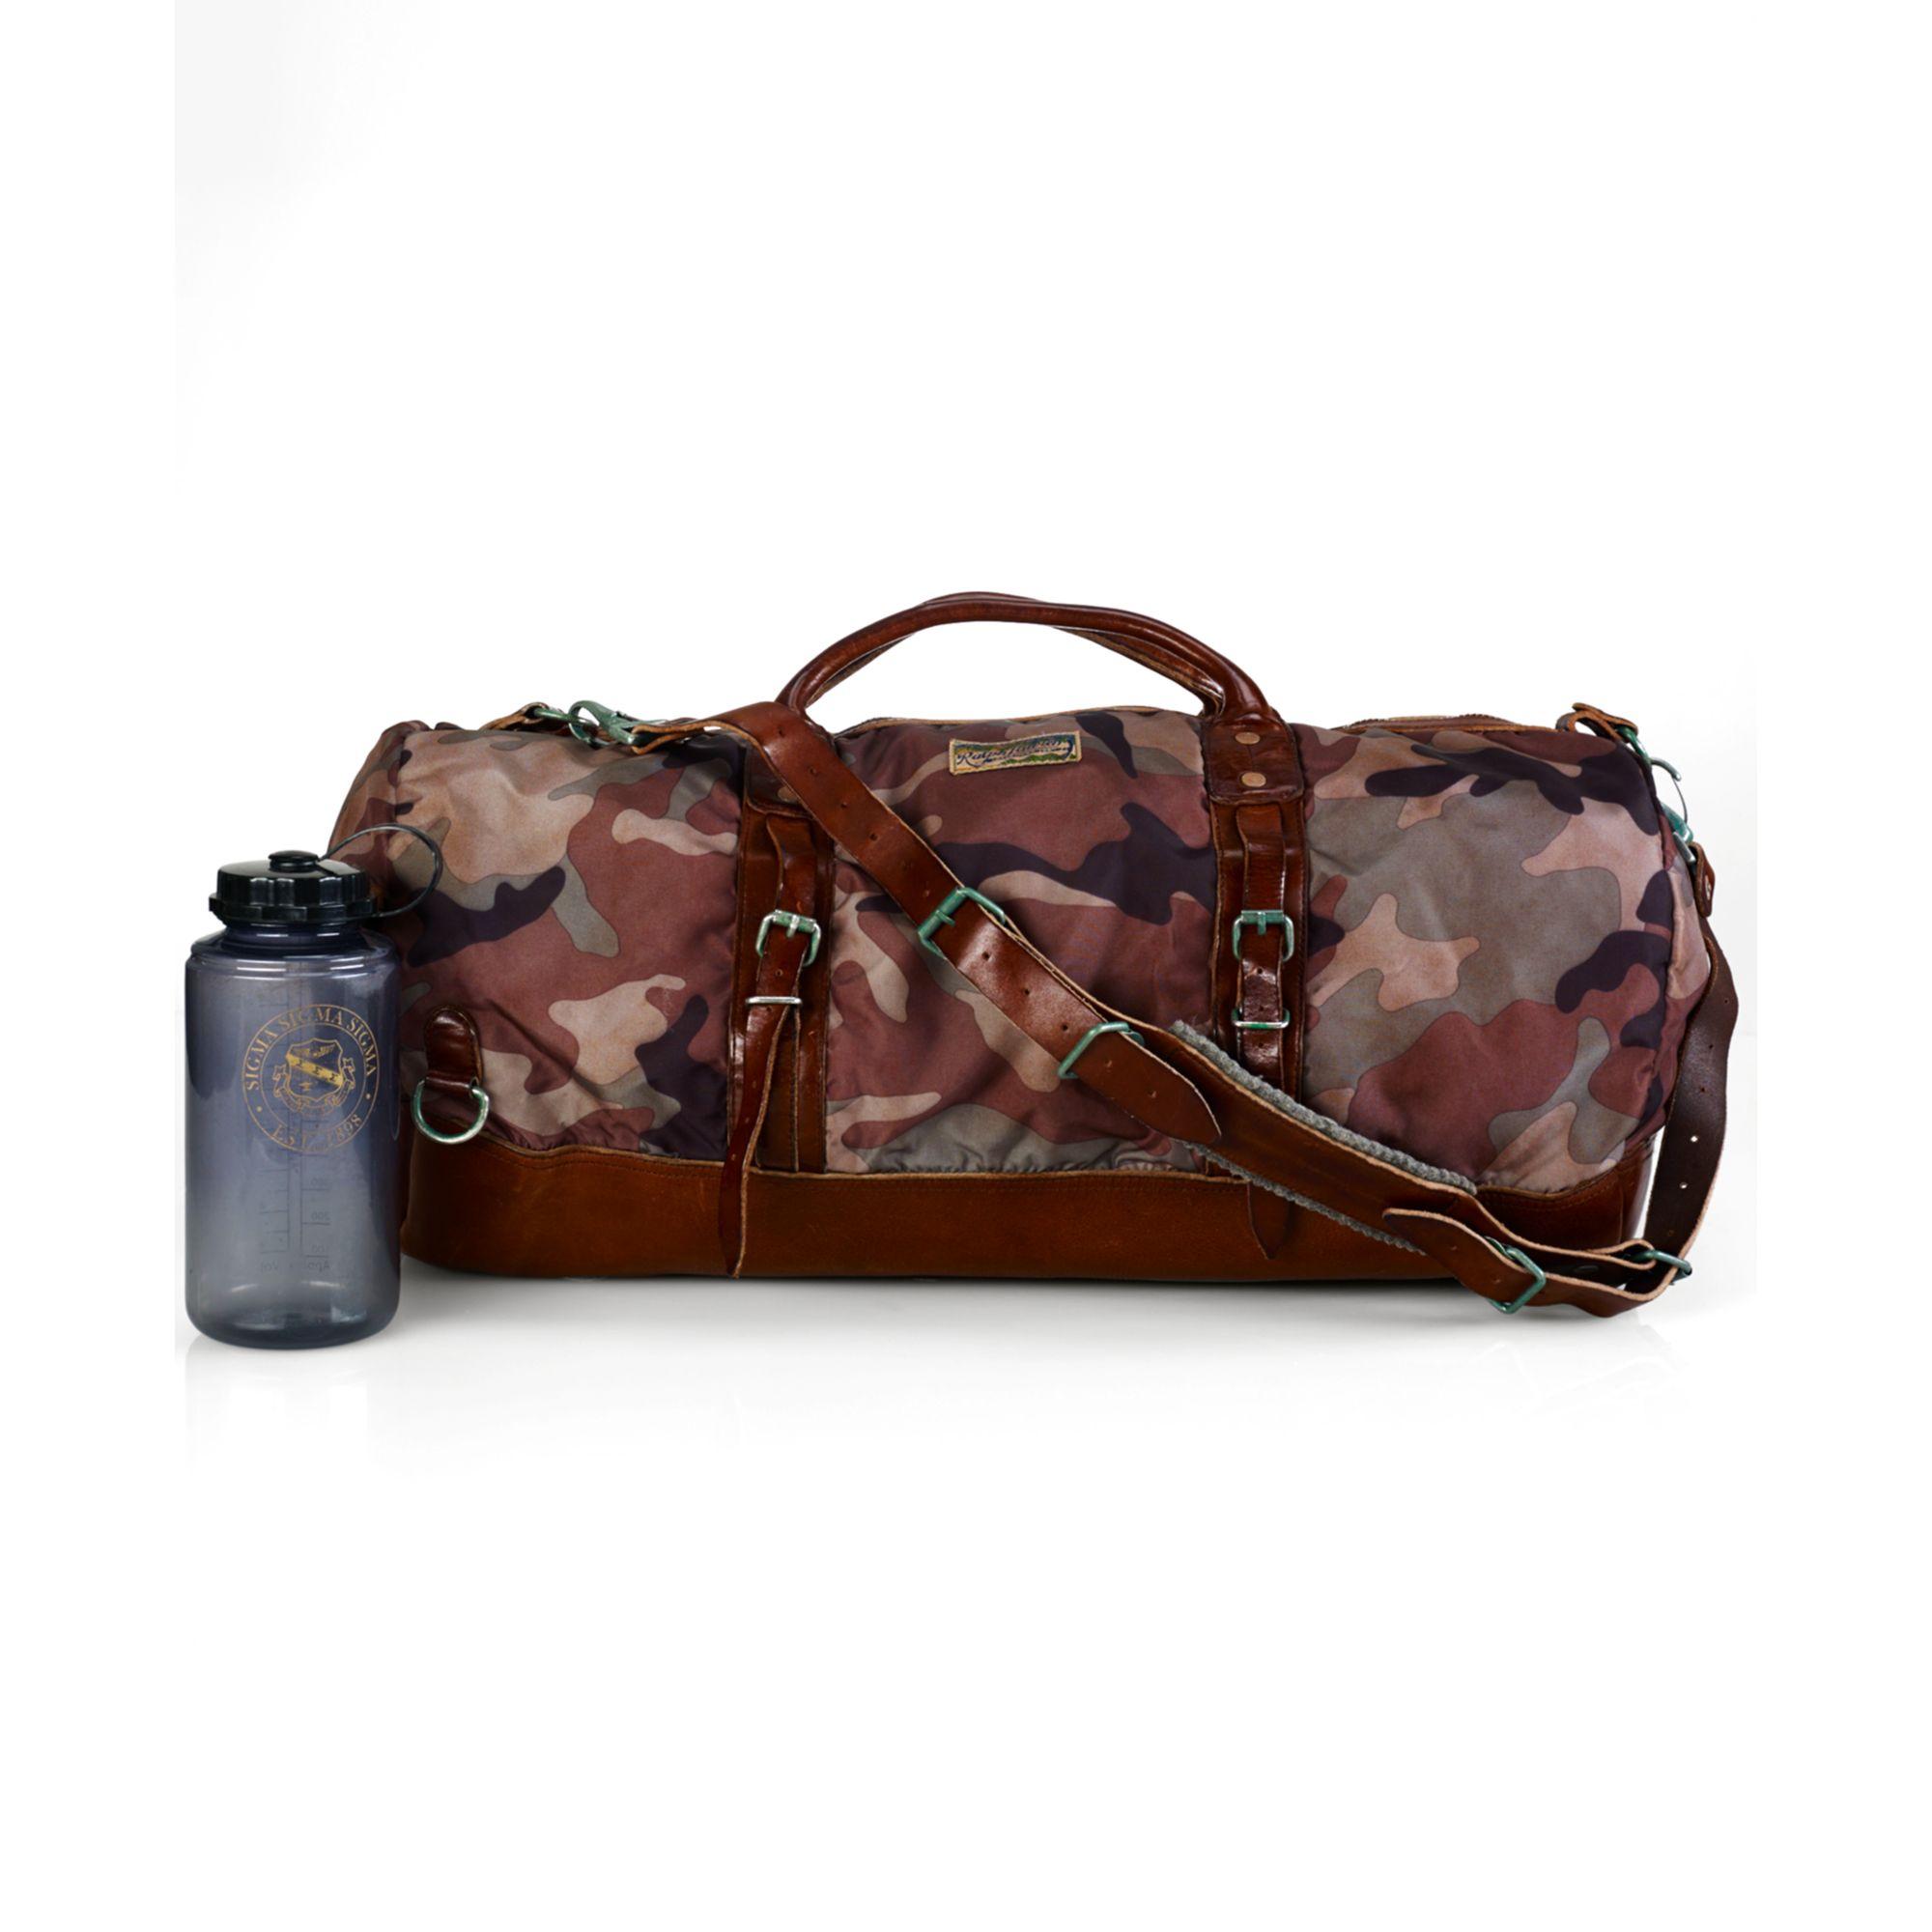 a0ba89e8820 ... ireland lyst ralph lauren polo camo nylon duffel bag in brown for men  9f94c 04ca9 ...